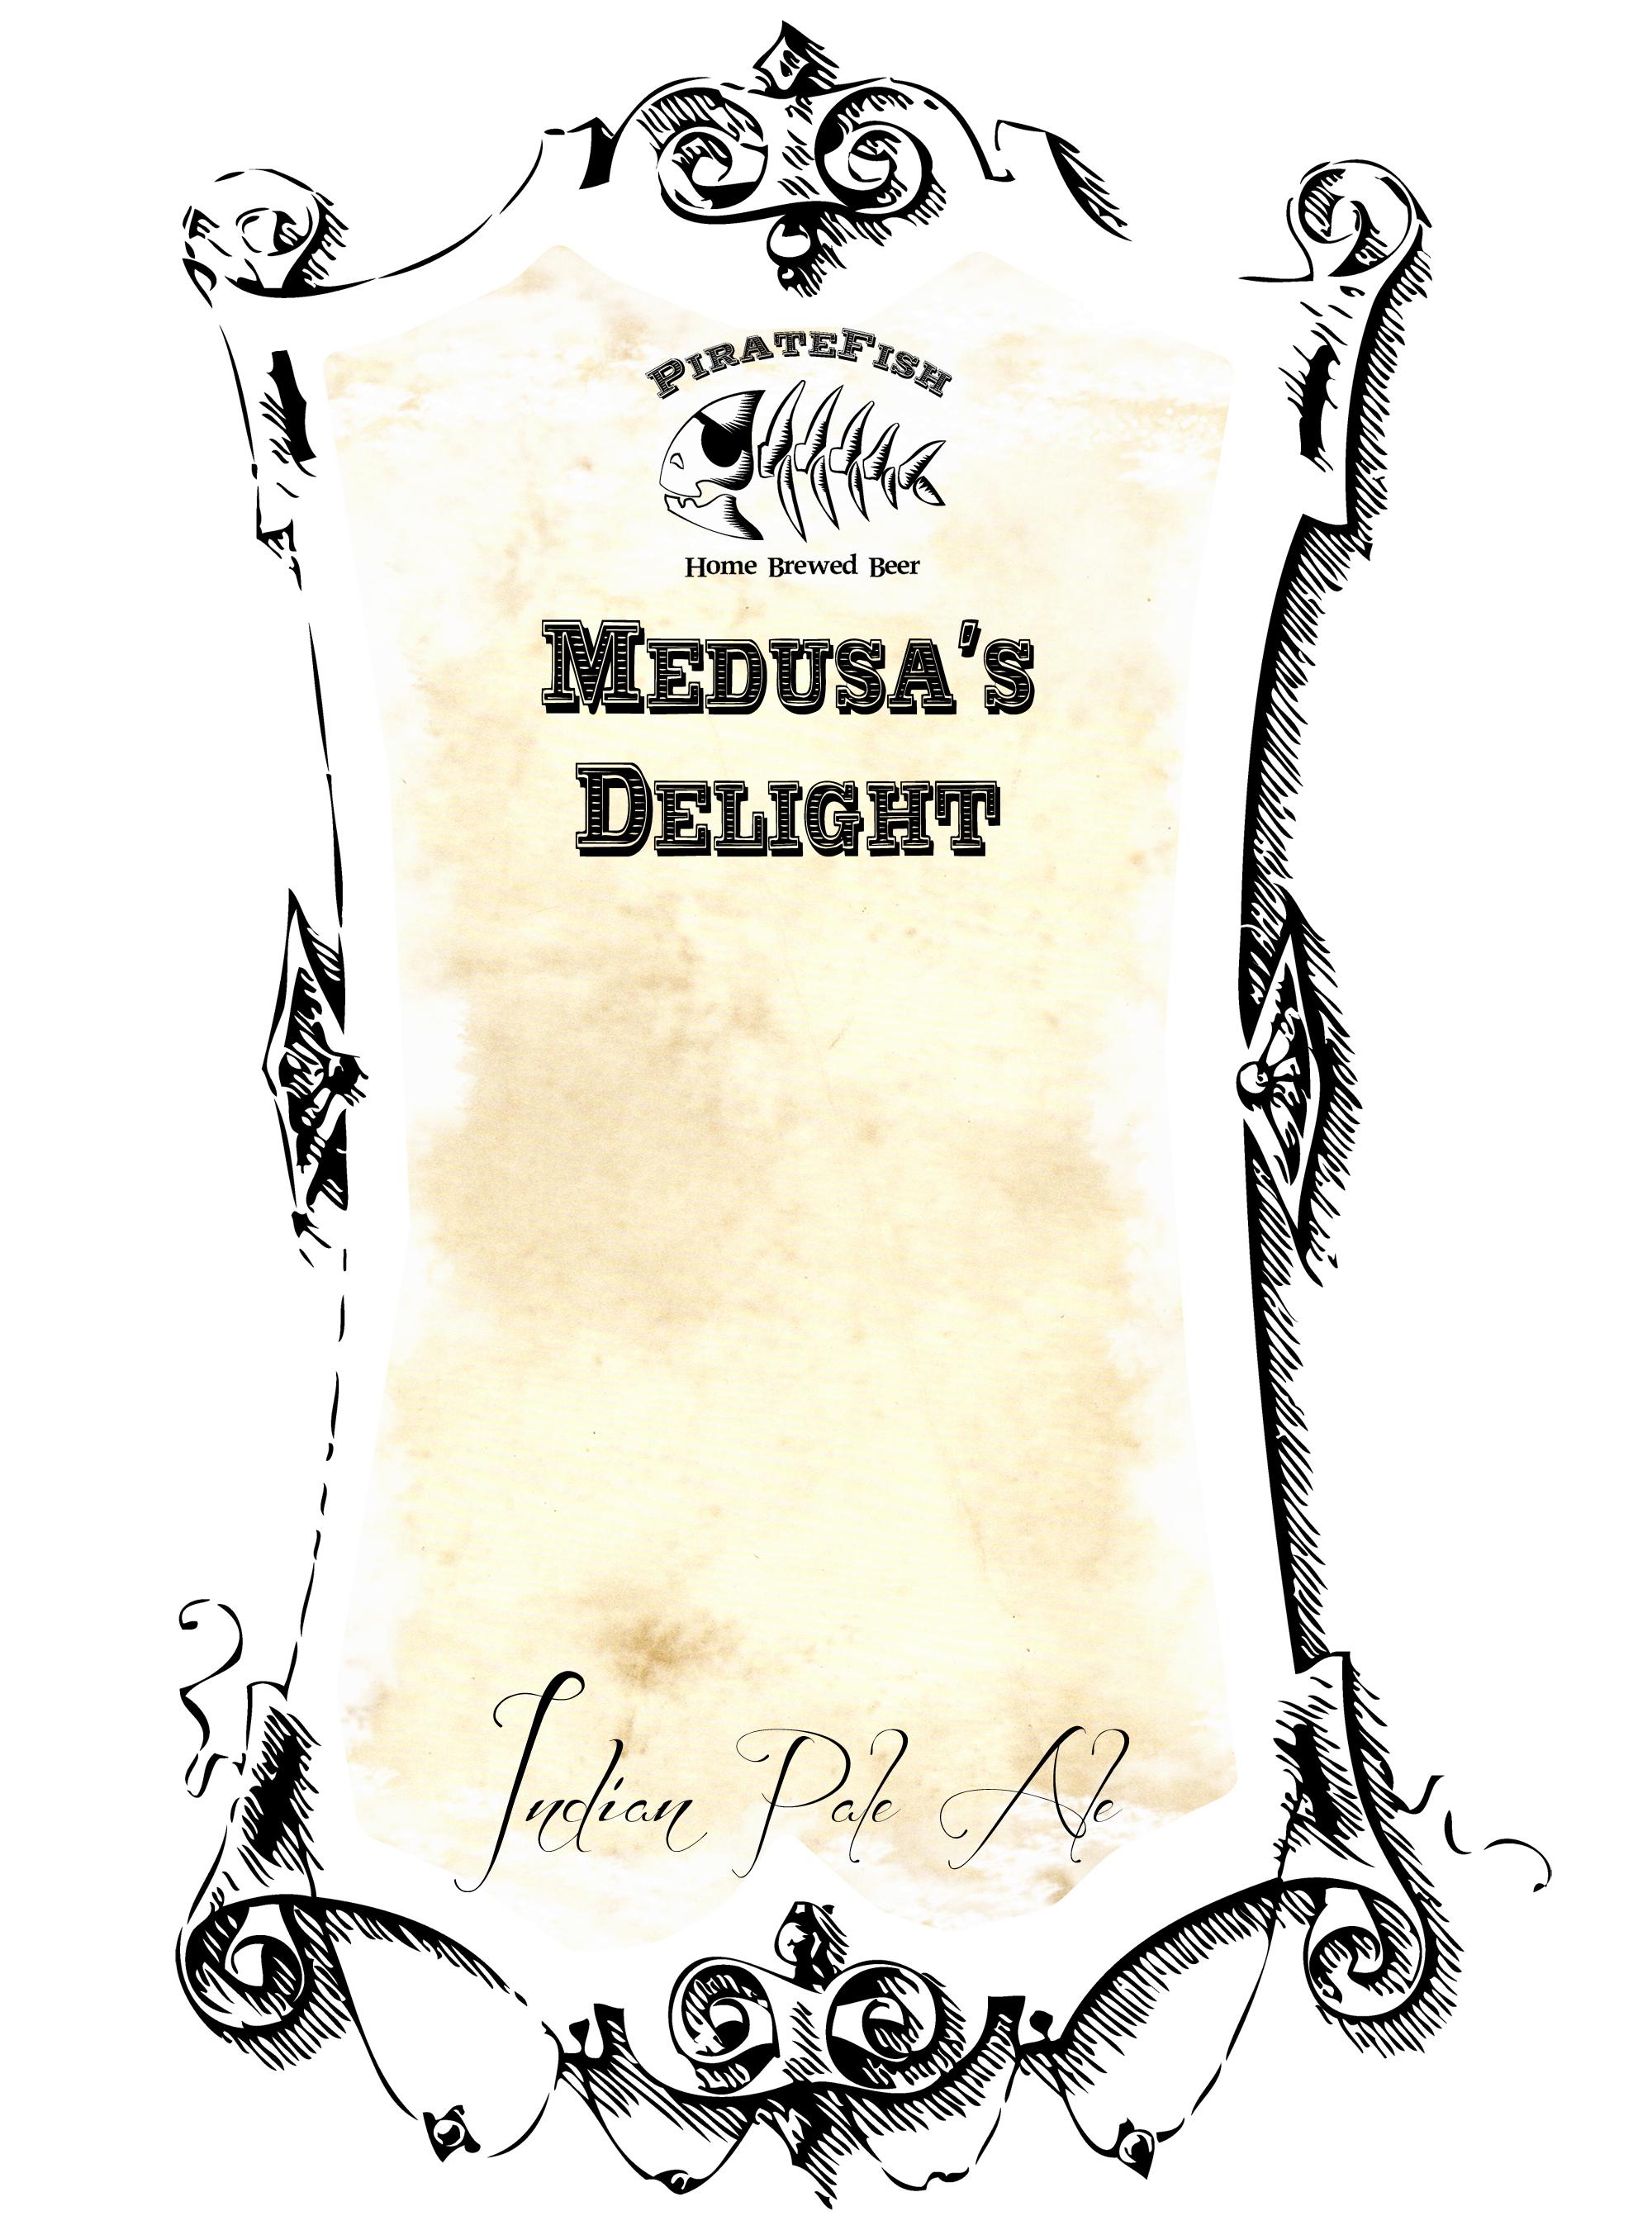 Beer Label Template Word Luxury Wine Label Template Word Portablegasgrillweber